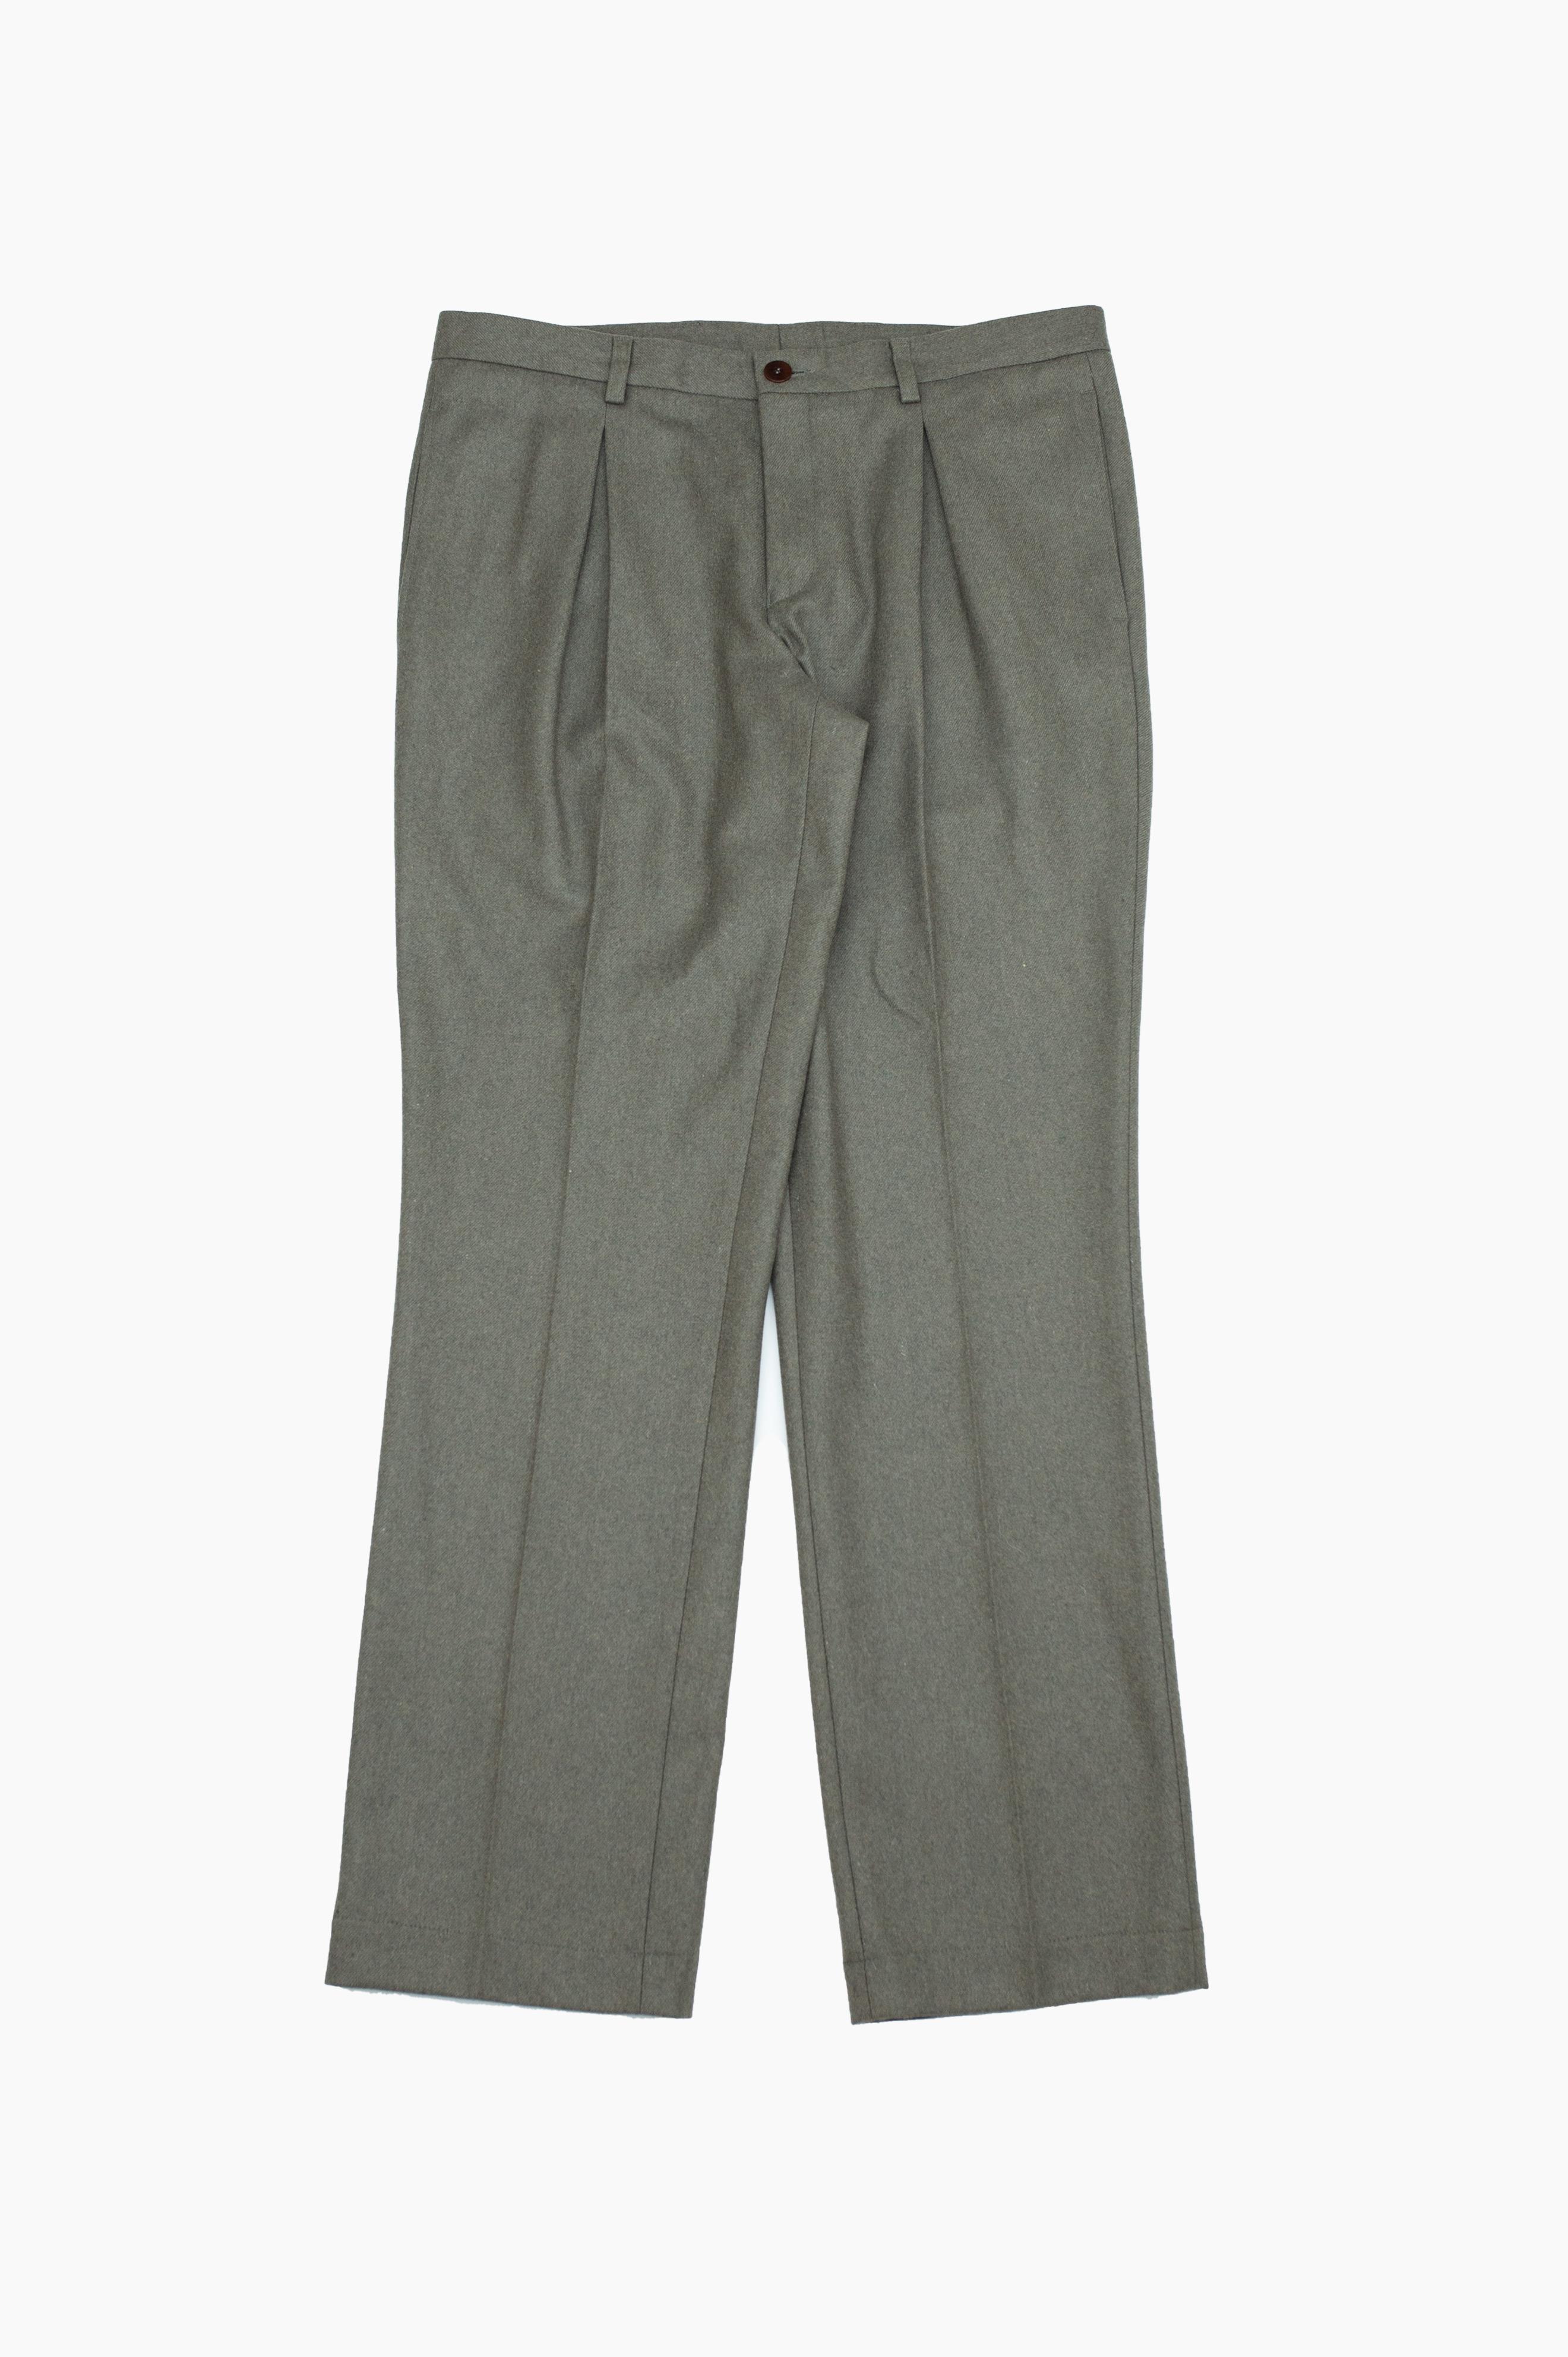 Setas Trousers Olive Green Mesc